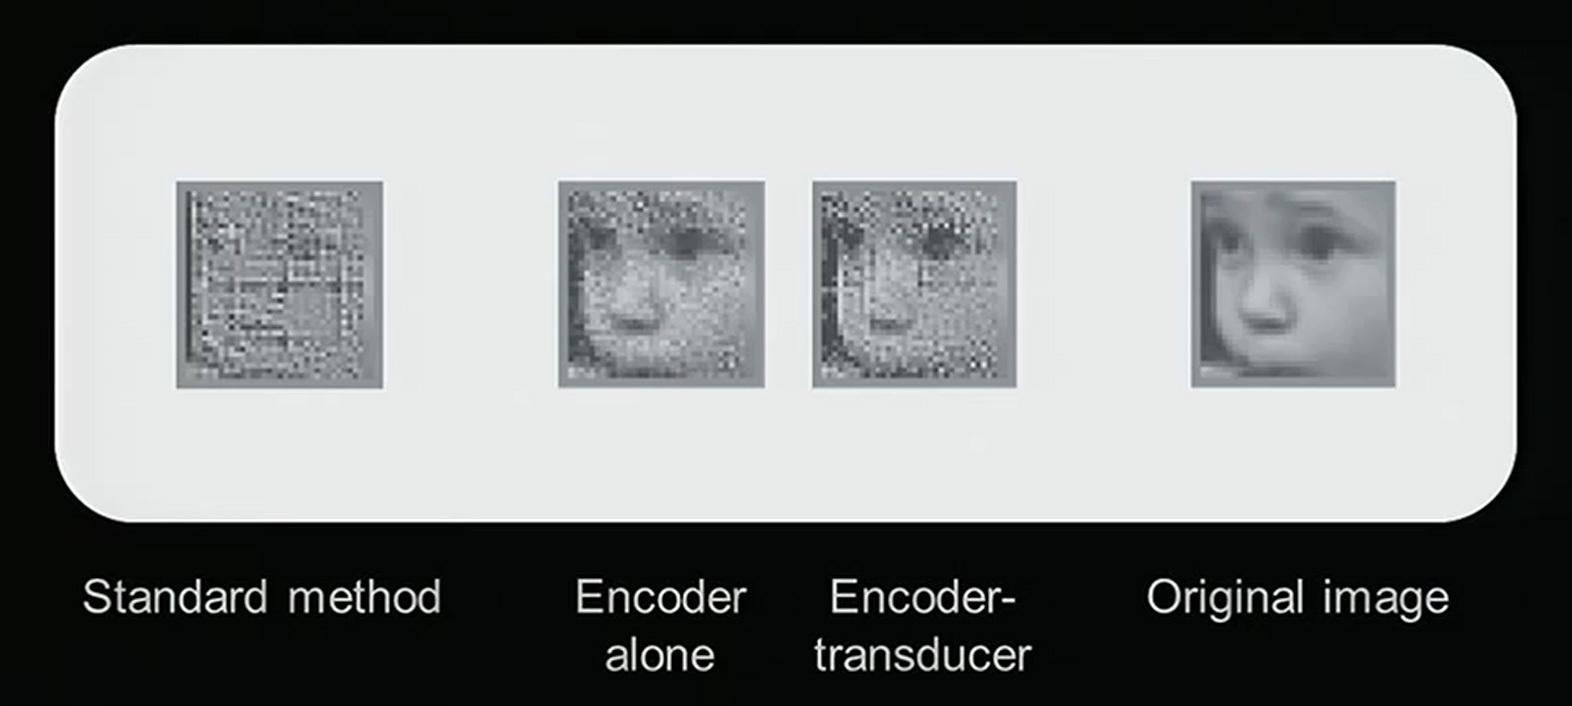 Comparison of various prosthetic eye/retina technologies